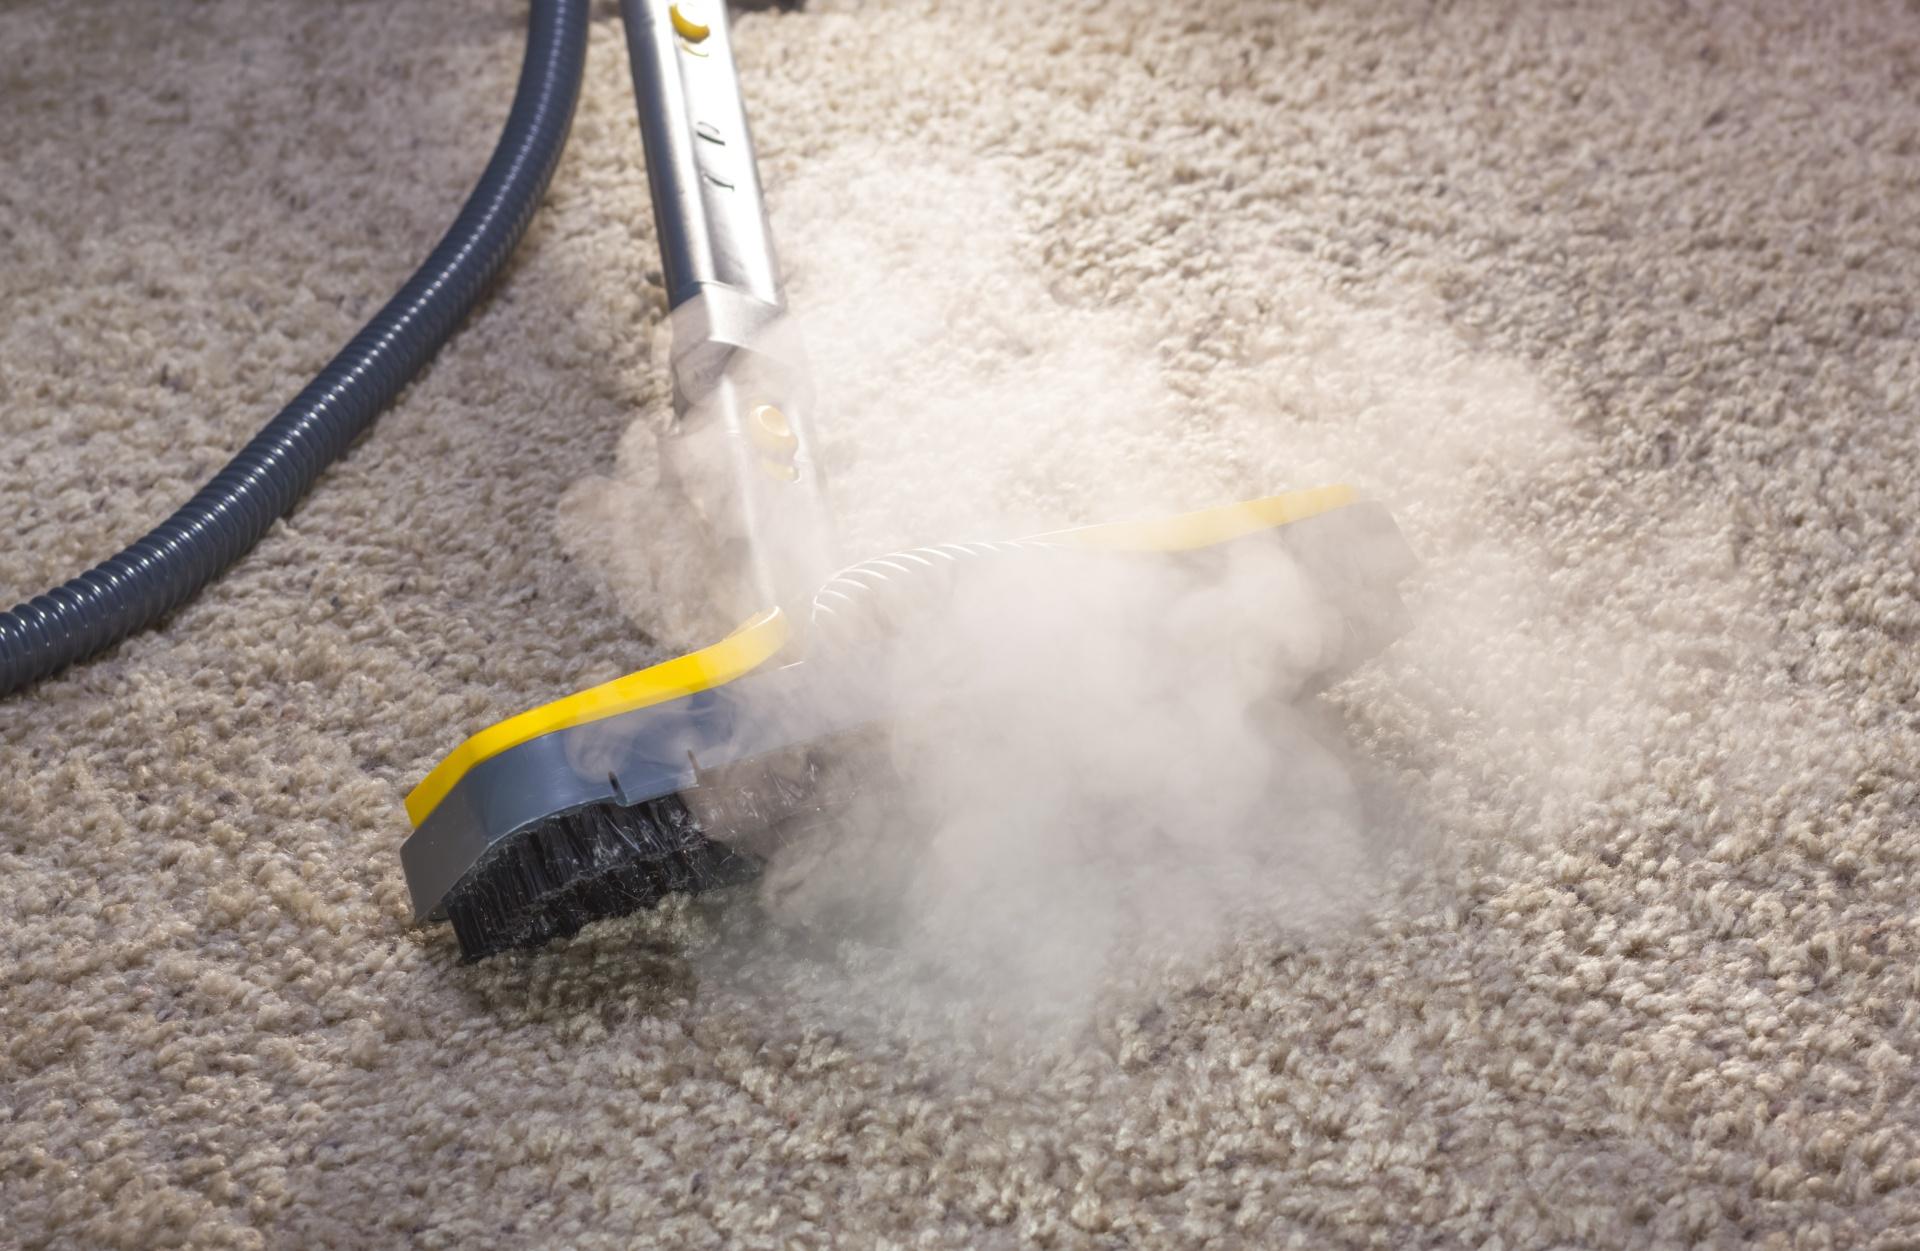 Using dry steam cleaner to sanitize floor carpet.